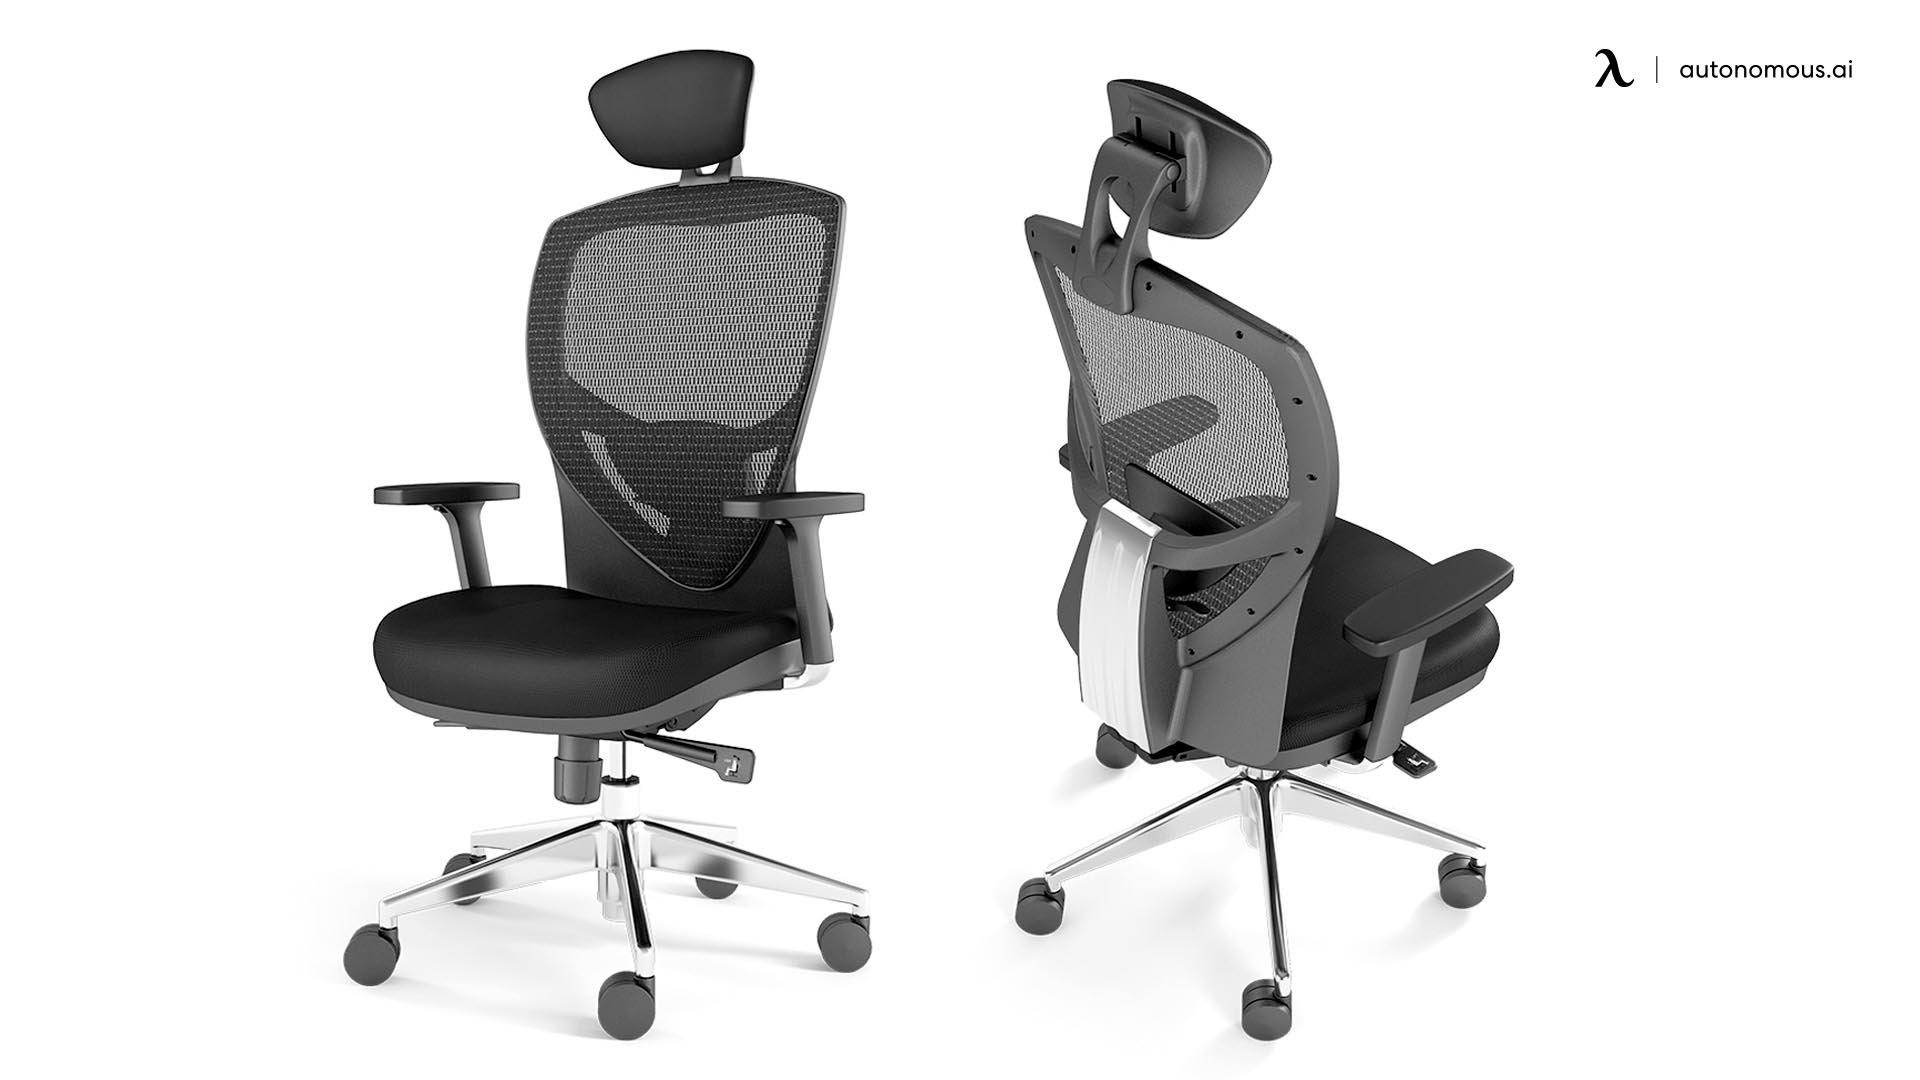 SYNCHRO Mesh Executive Ergonomic Desk Chair Australia